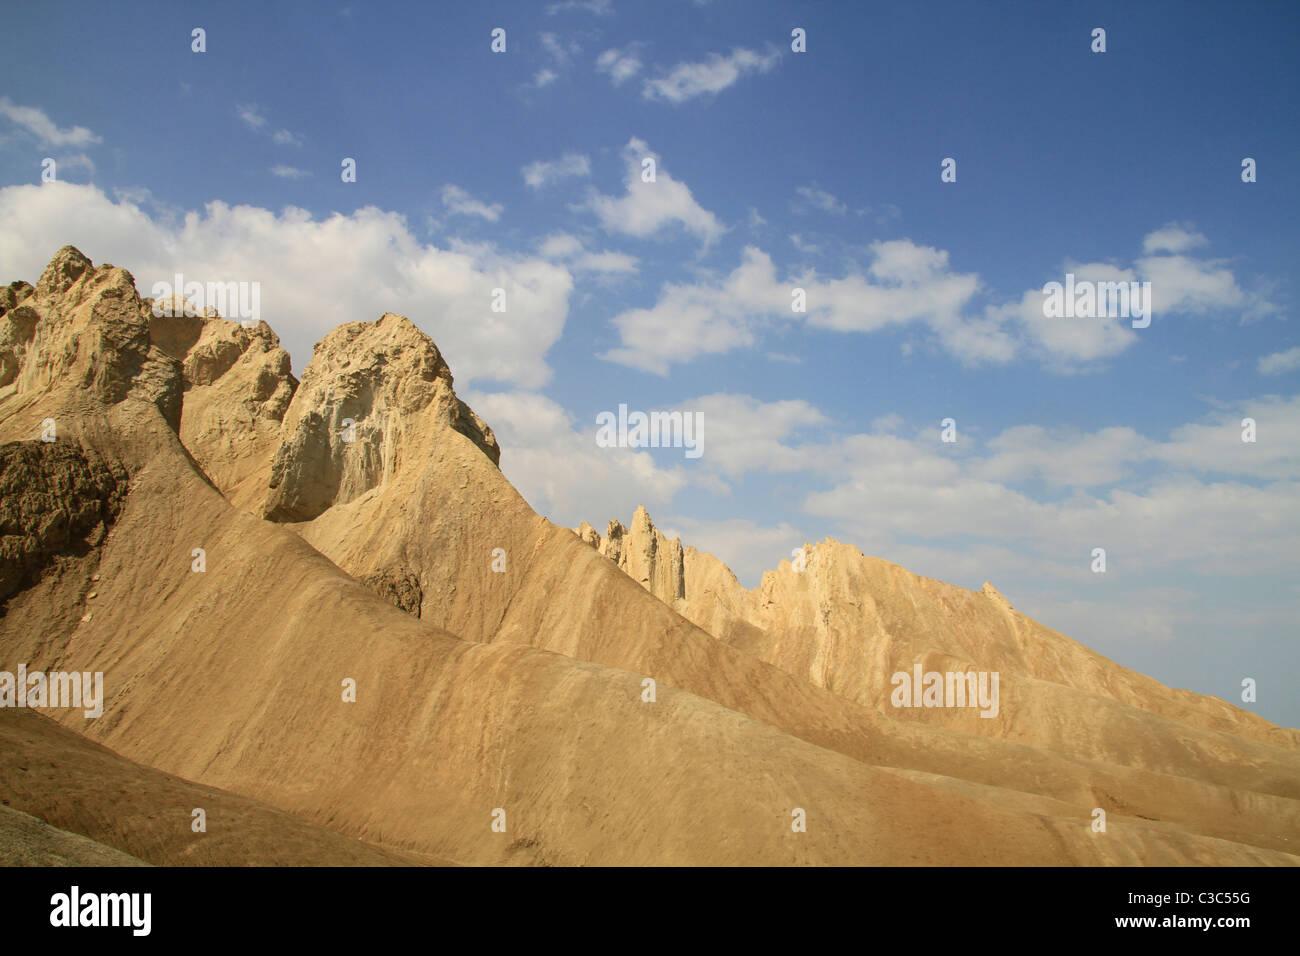 Israel, Dead Sea valley, Mount Sodom by the Dead Sea Stock Photo